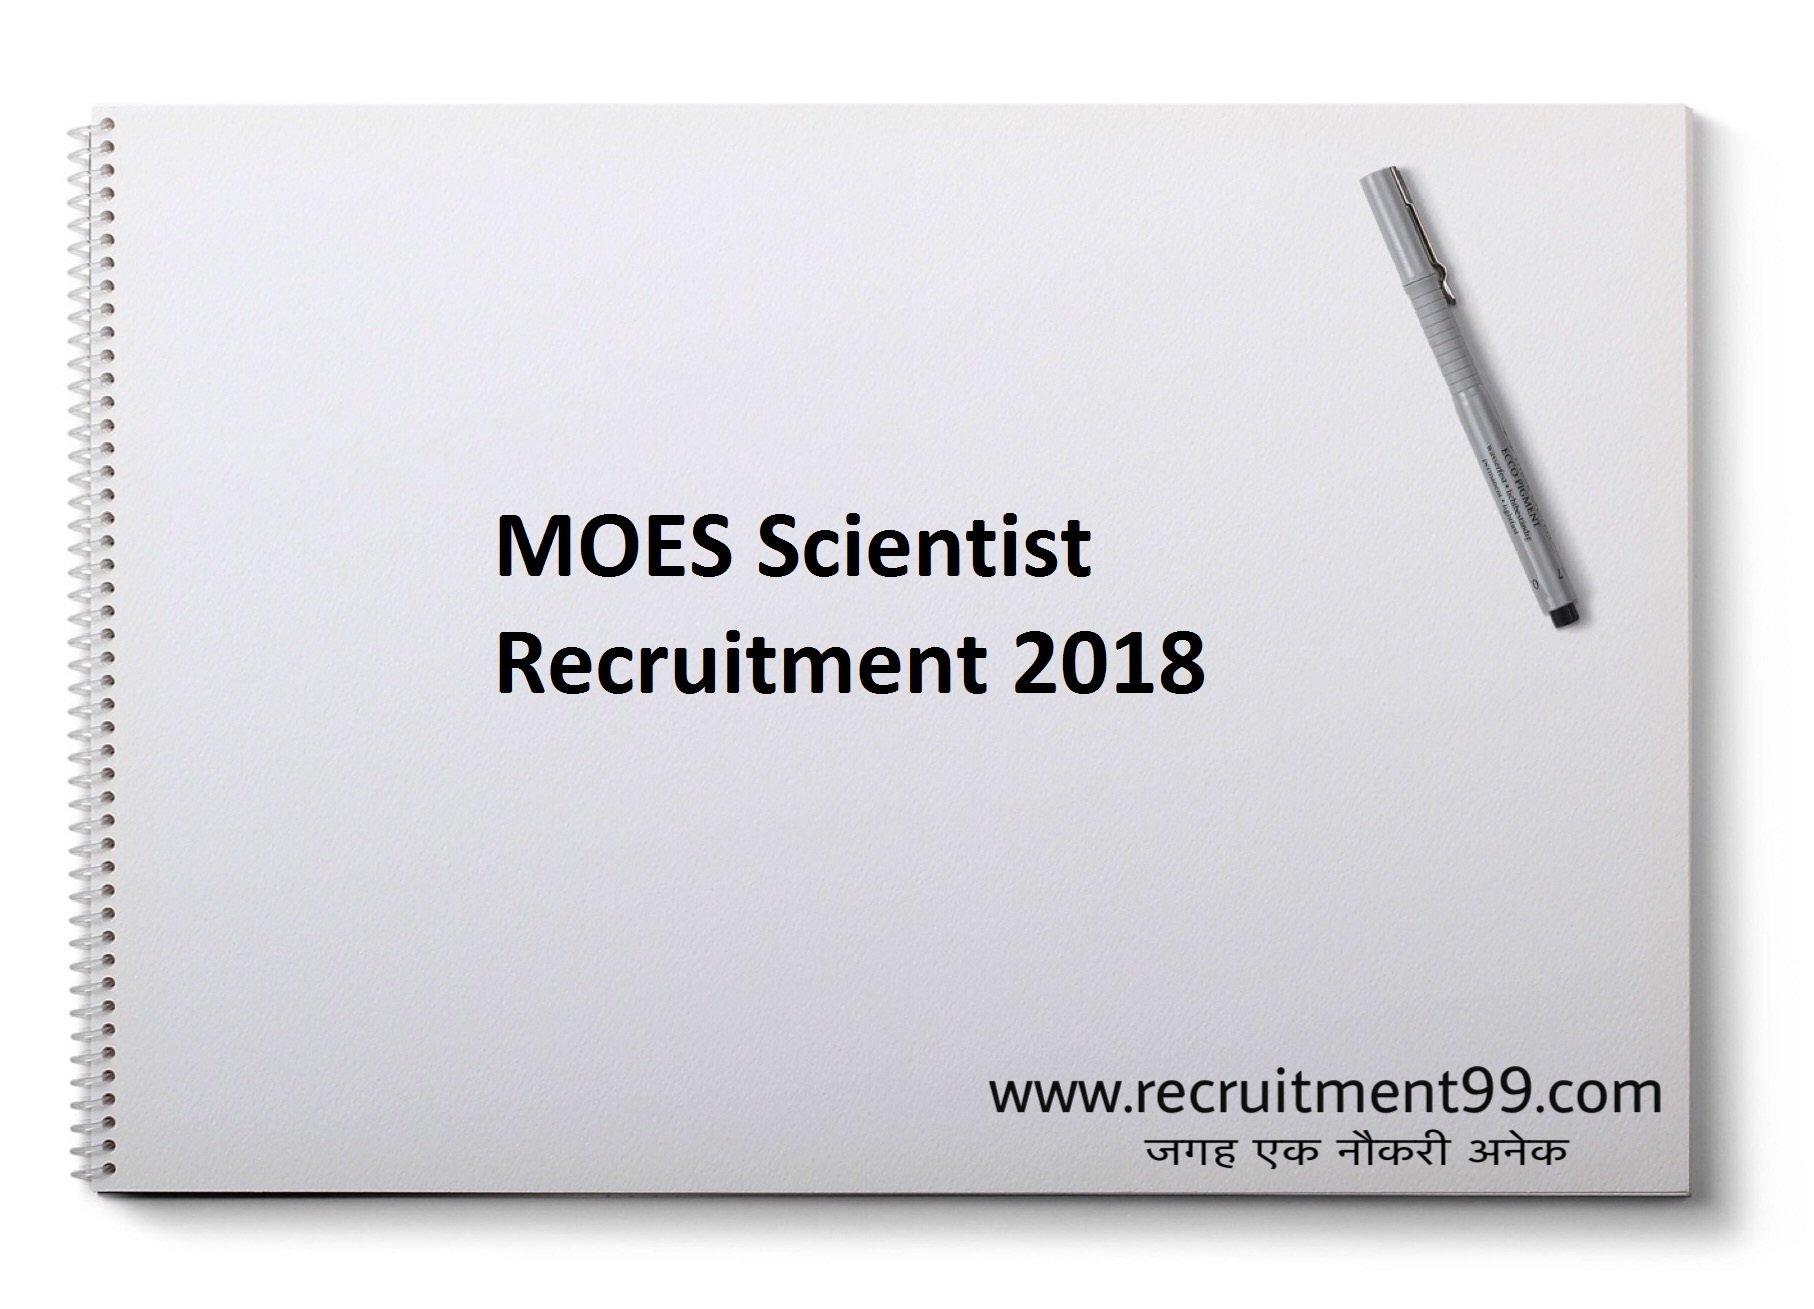 MOES Scientist Recruitment Admit Card Result 2018